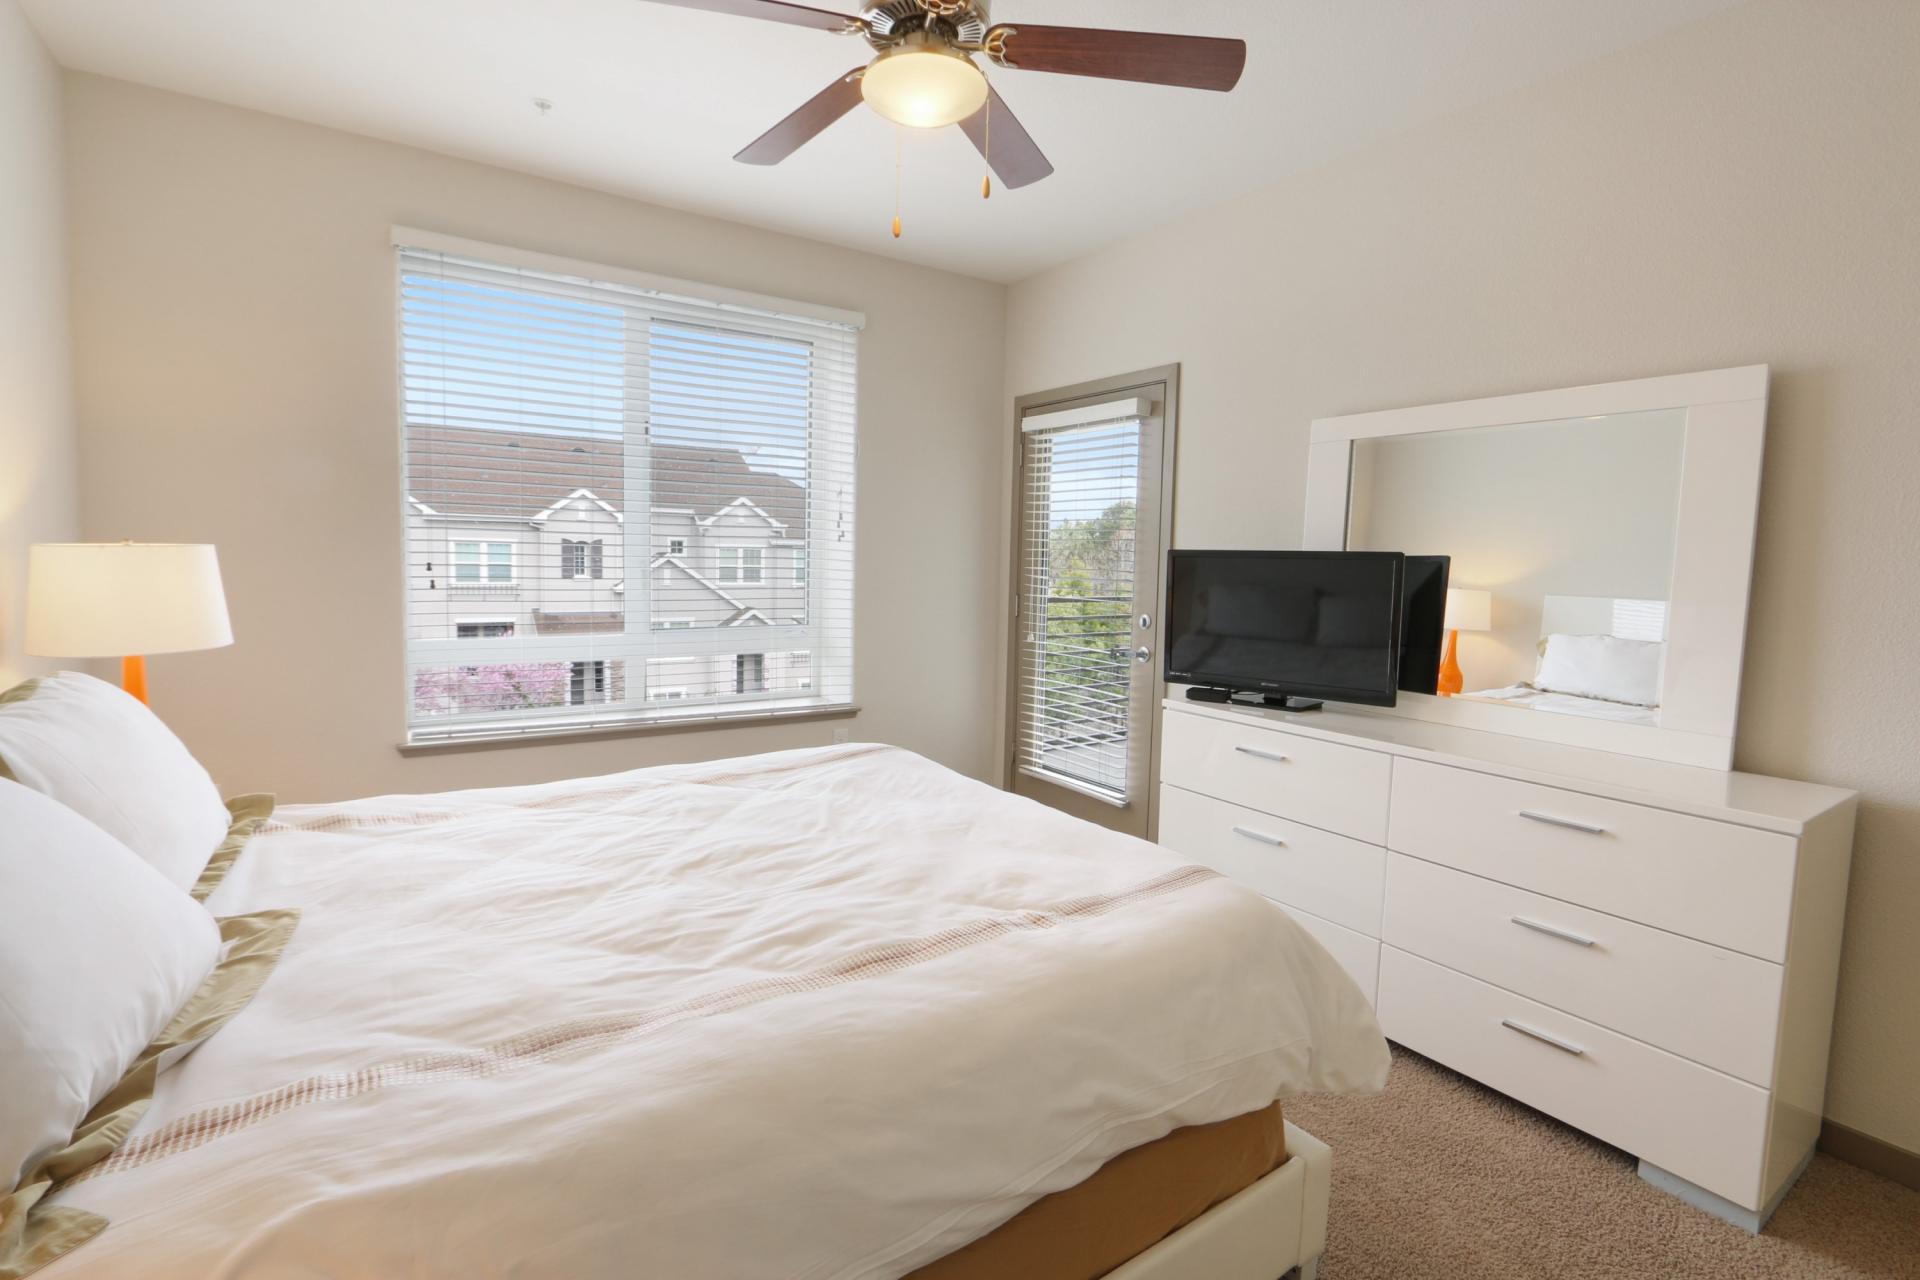 Bedroom at Anton Apartments, Lakewood, Sunnyvale